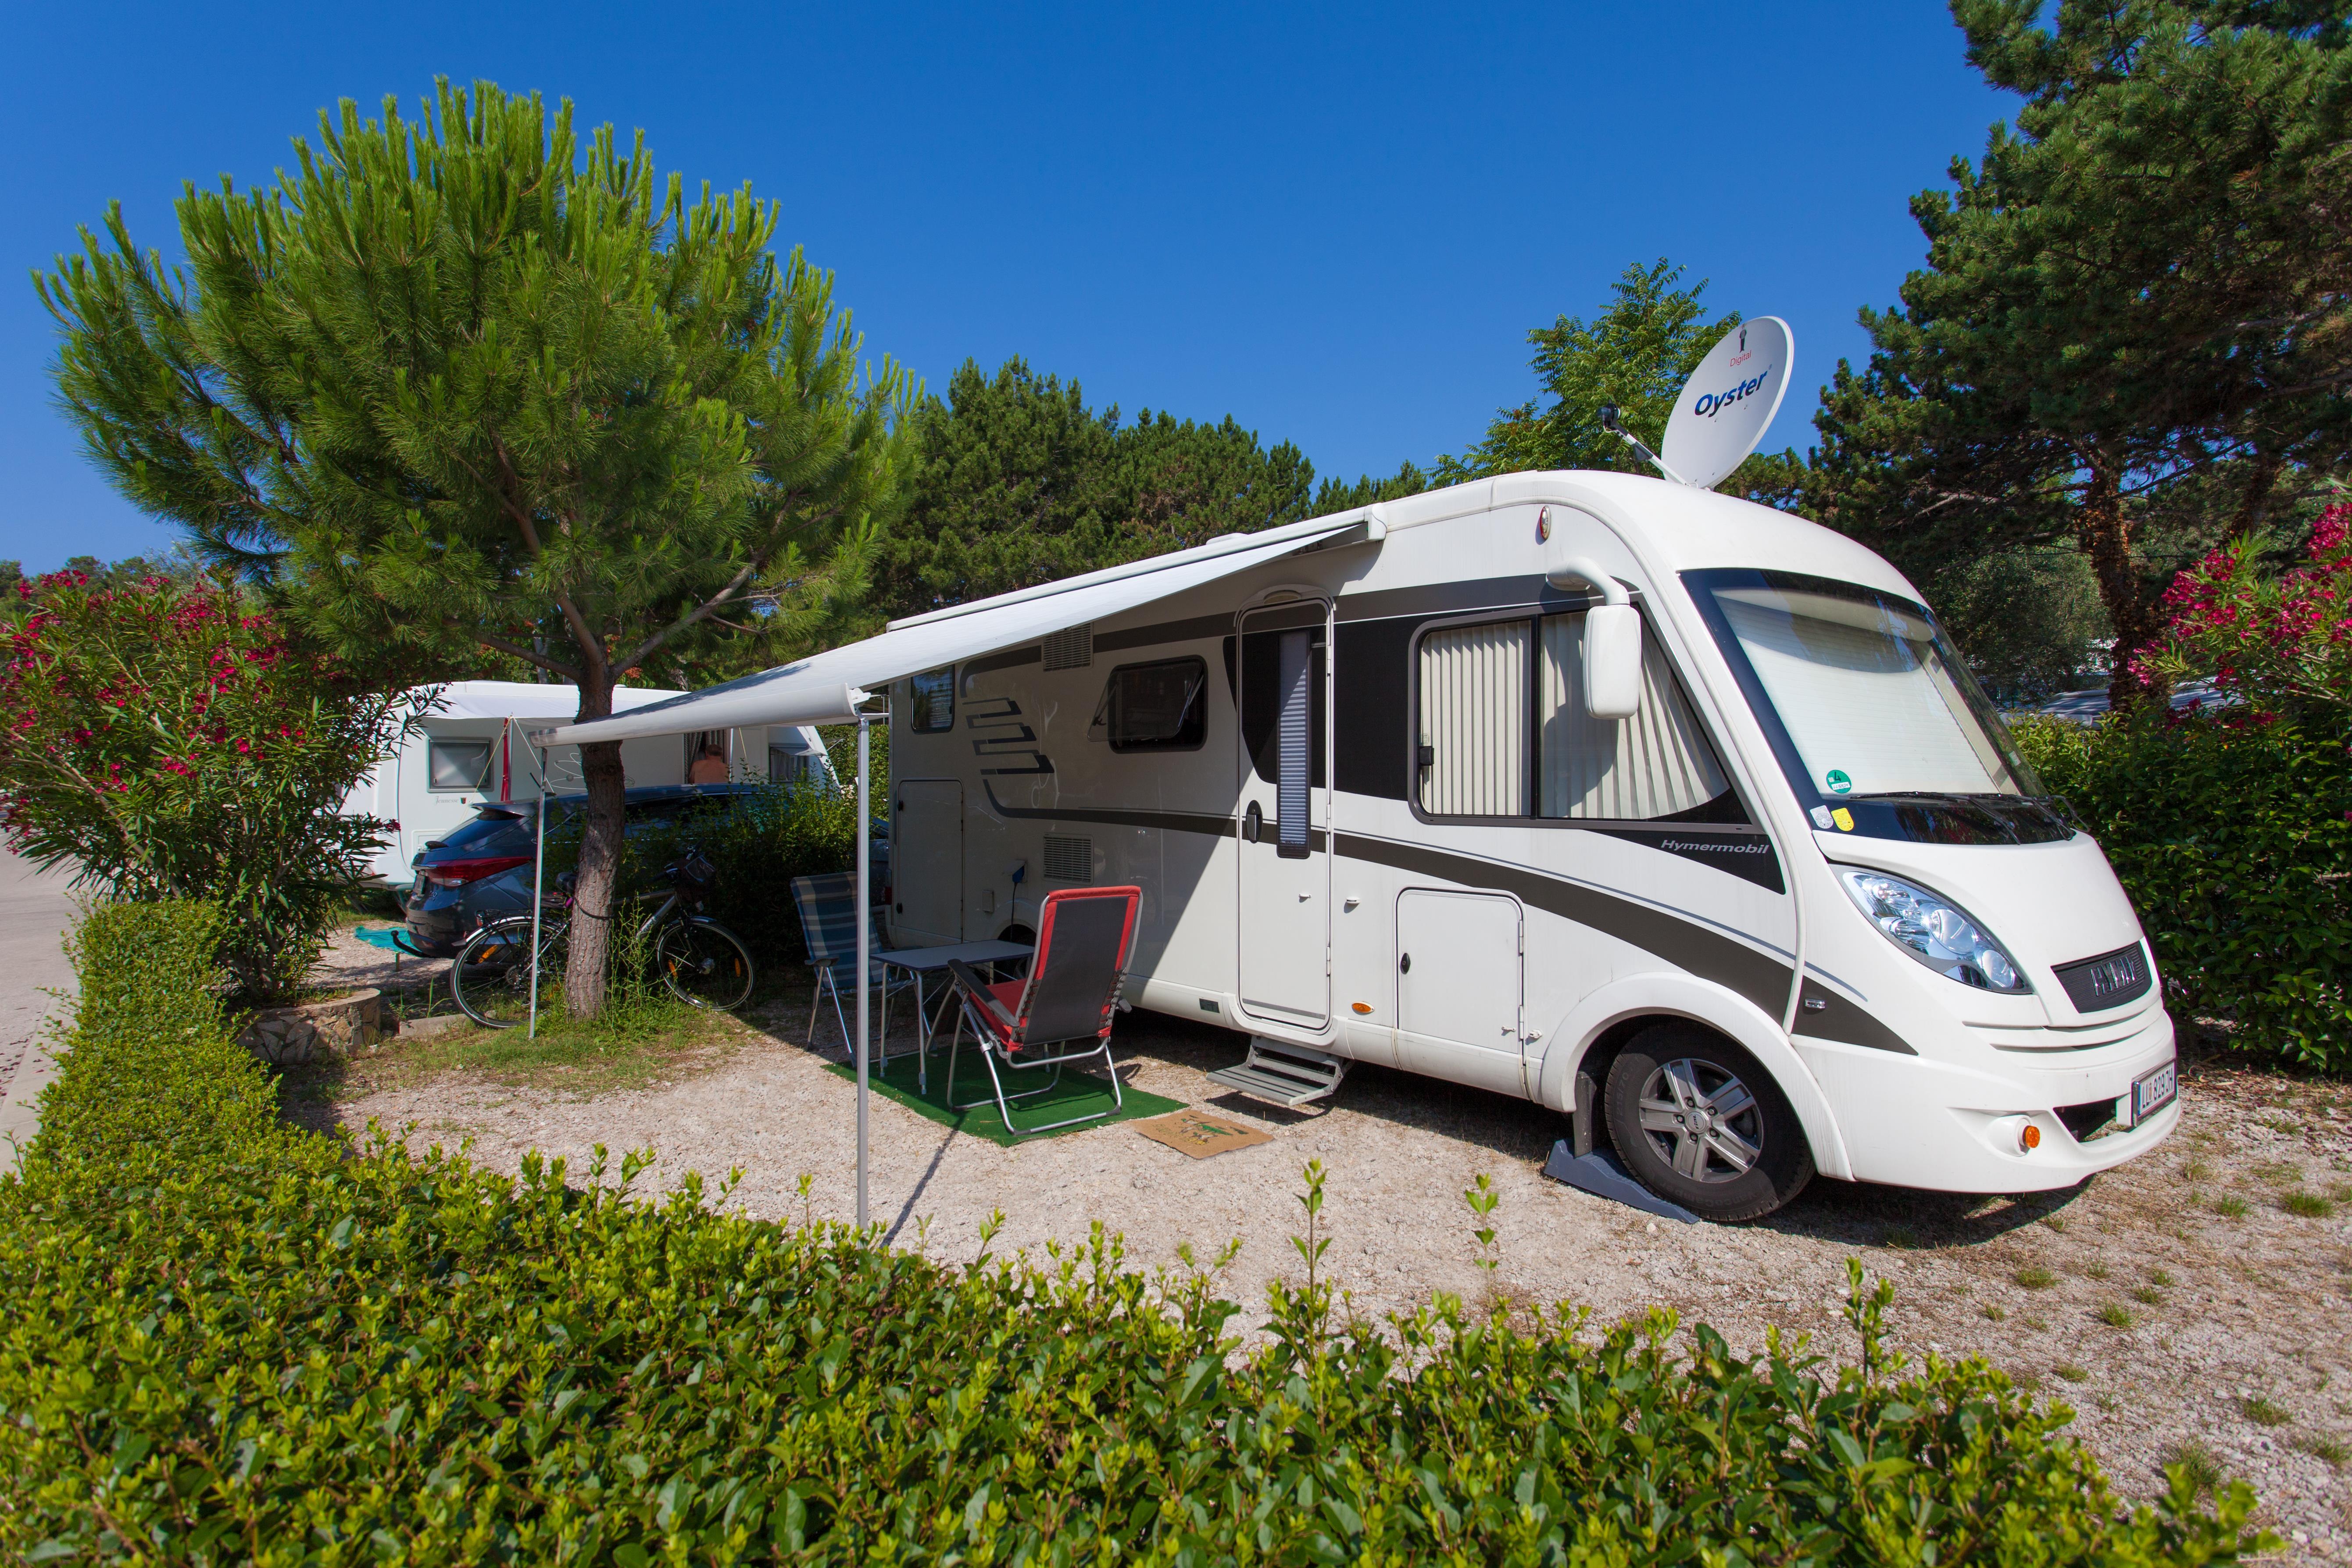 Emplacement - Emplacement Comfort - Ježevac Premium Camping Resort